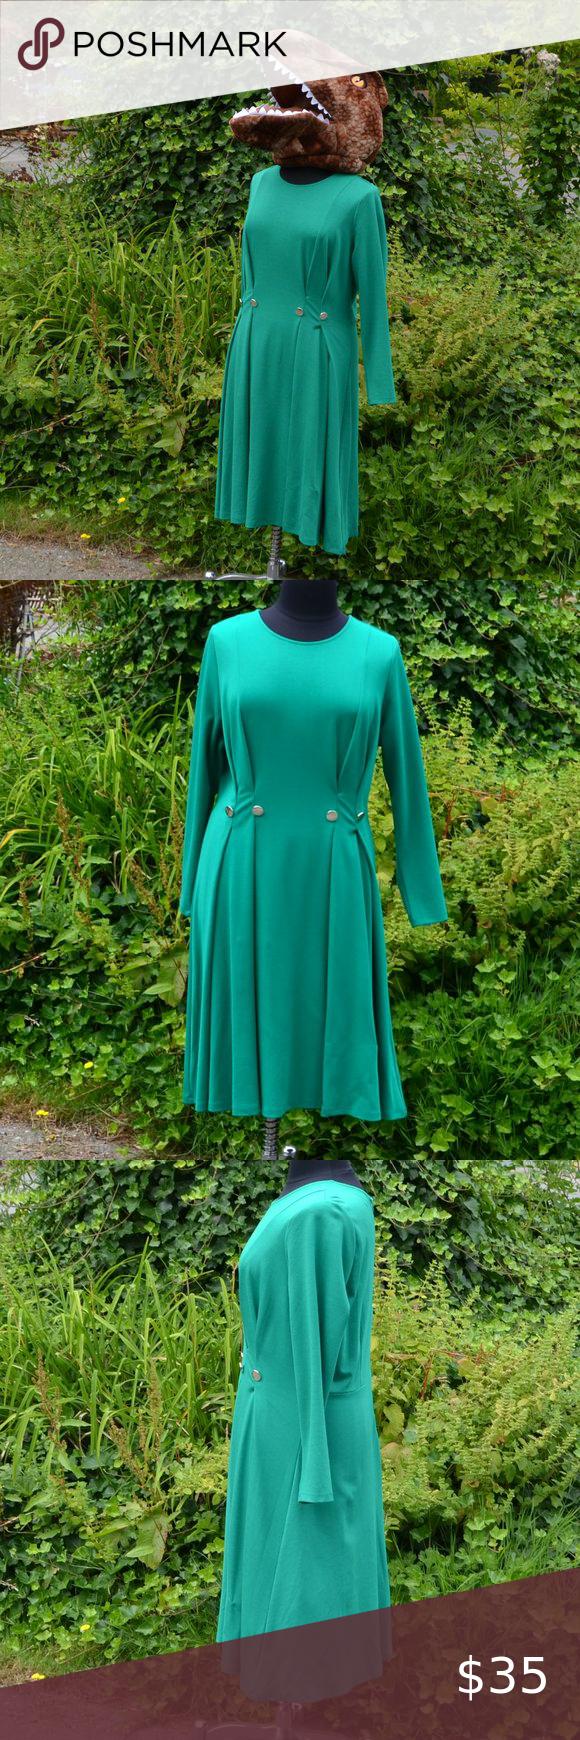 Eloquii 20 Green Knit Long Sleeve Midi Dress Long Sleeve Midi Dress Green Midi Dress Long Sleeve Midi [ 1740 x 580 Pixel ]